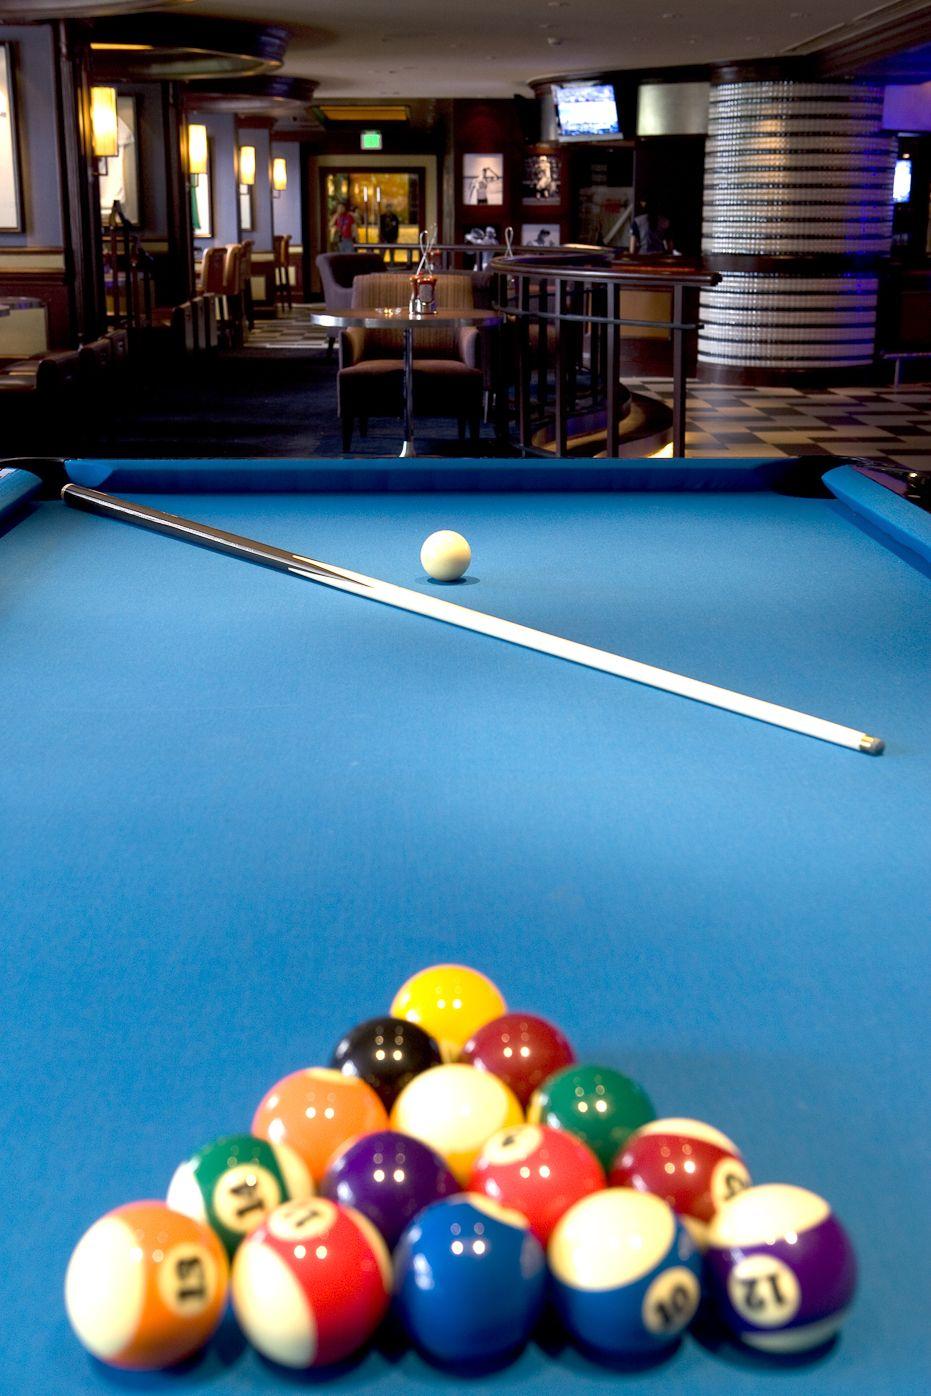 Billiards, anyone? Billiards game, Billiards, Pool games